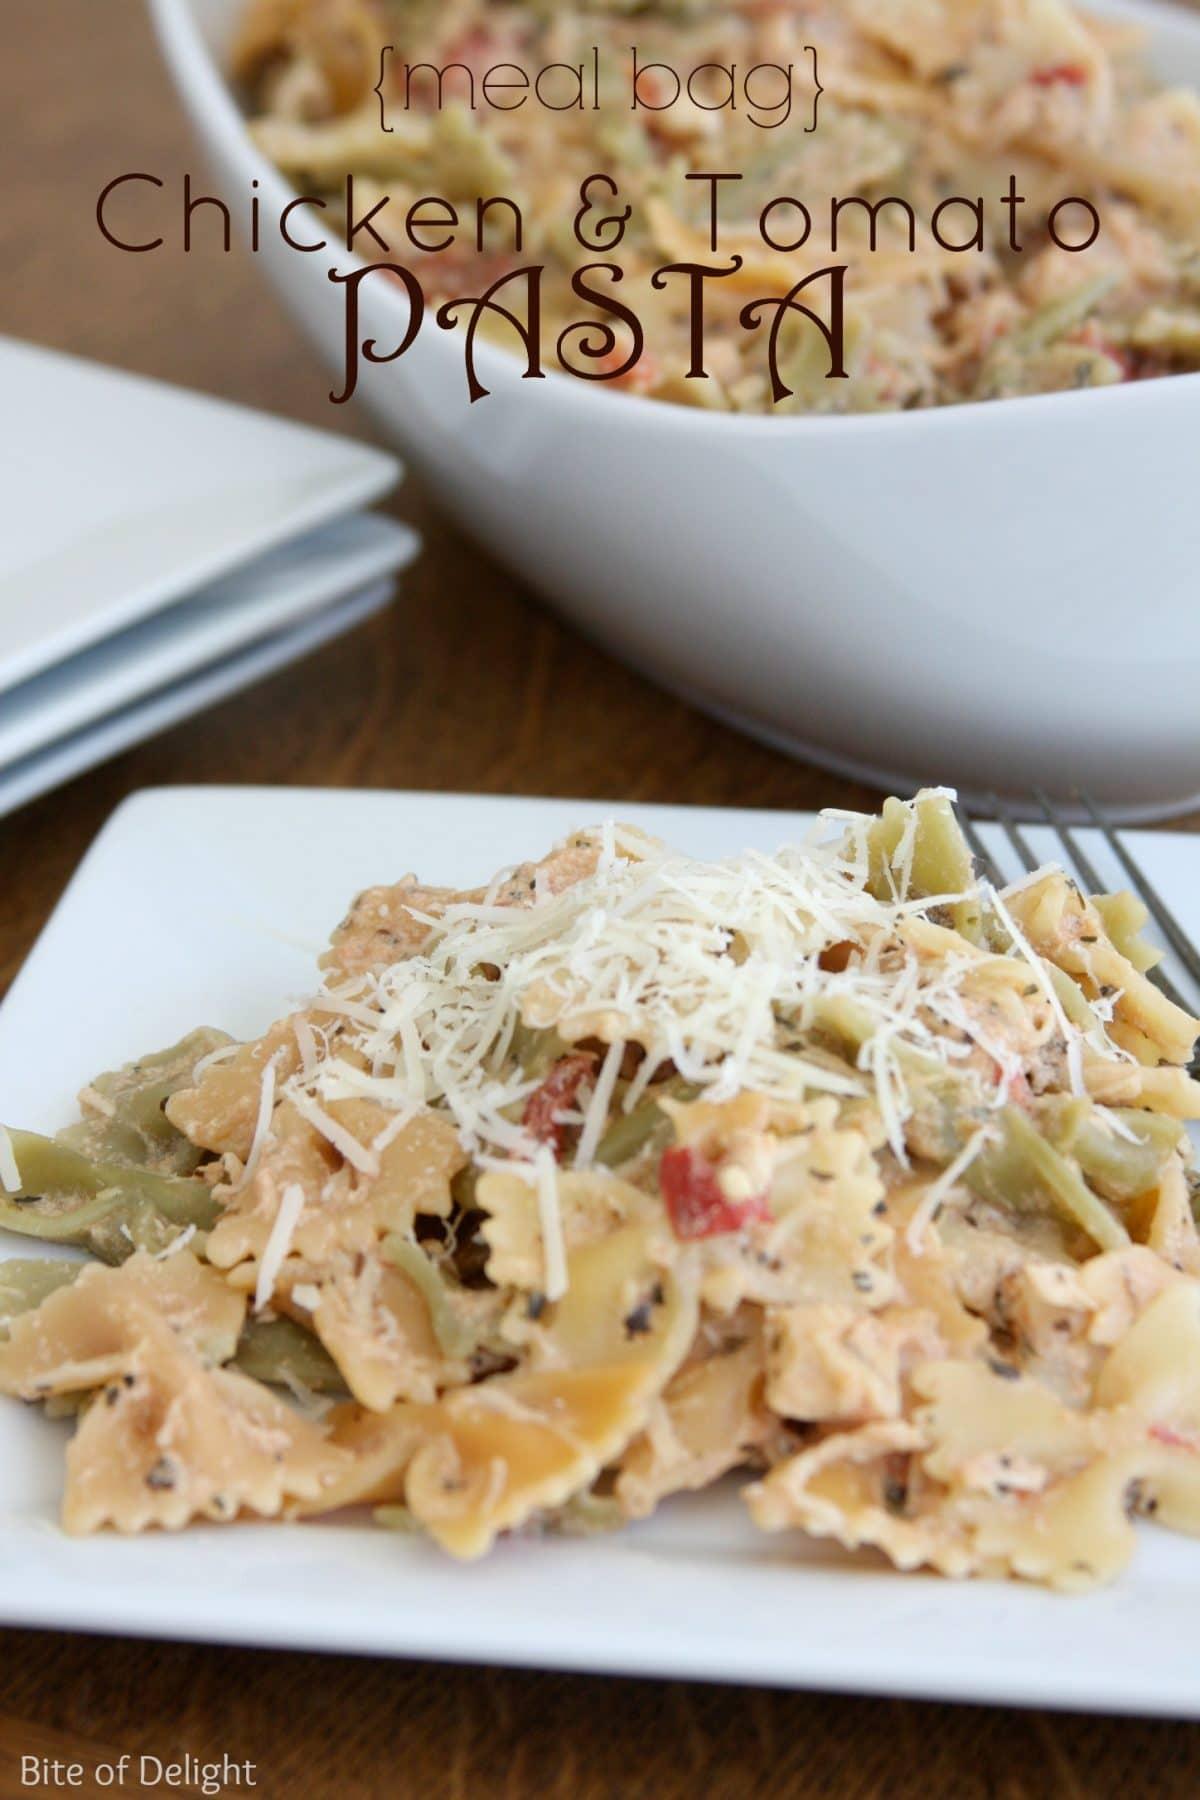 Chicken & Tomato Pasta via @somewhatsimple